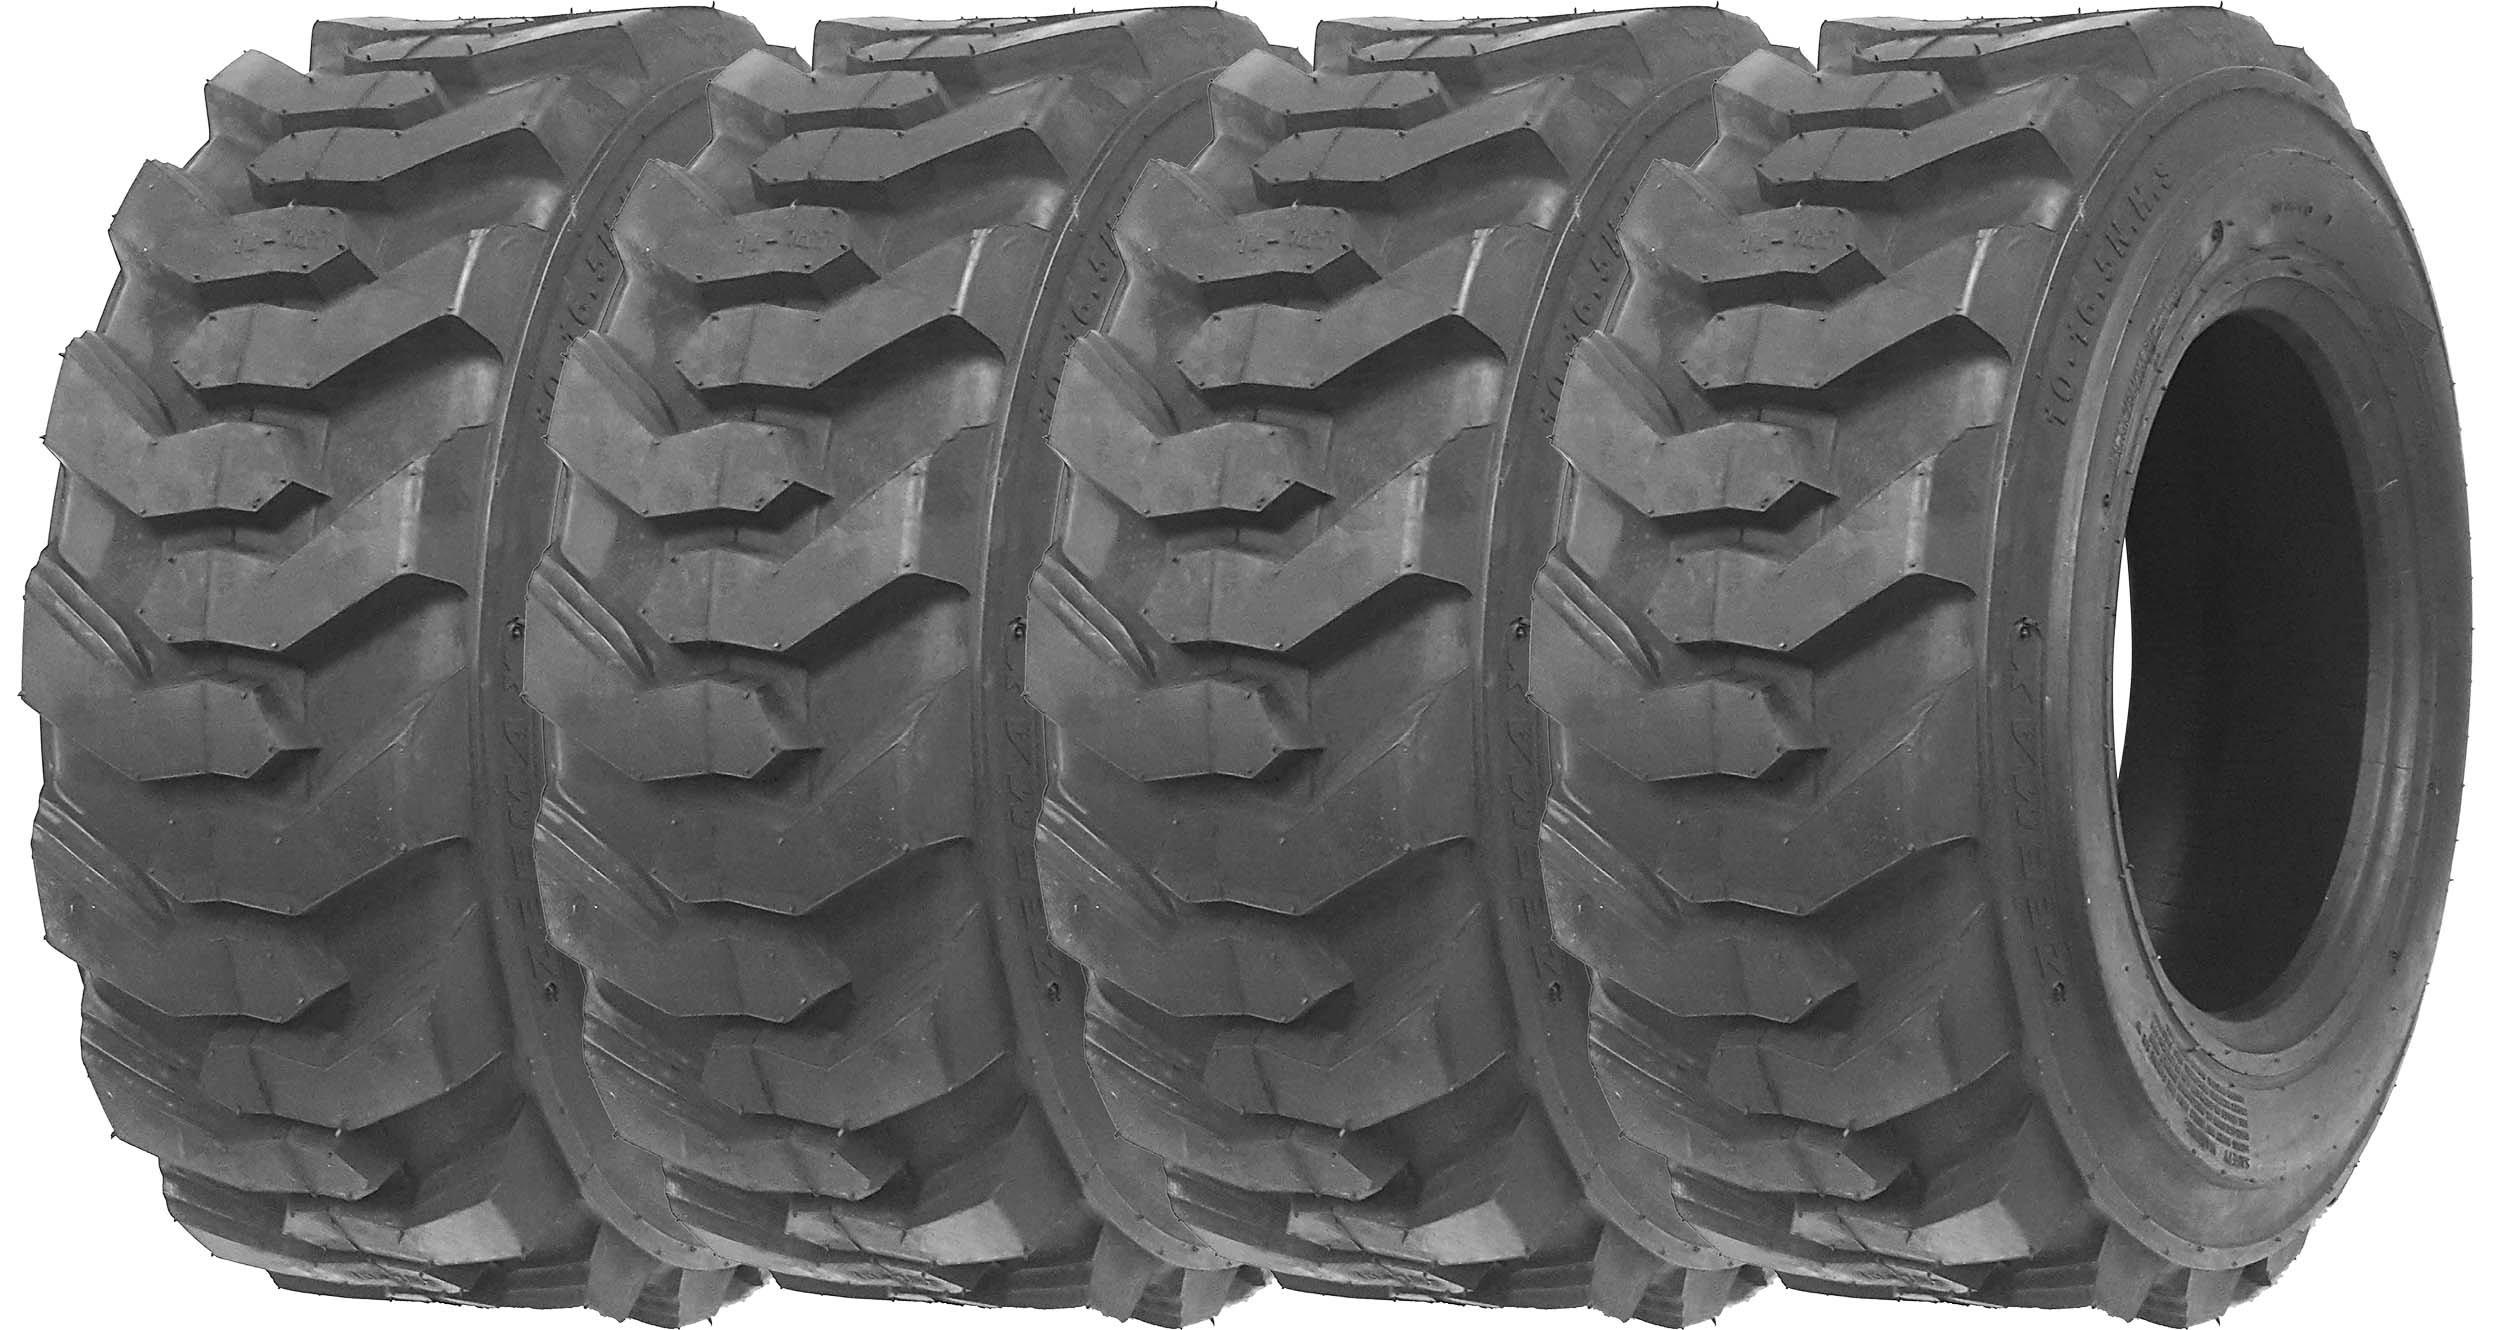 Set of 4 New ZEEMAX Heavy Duty 12-16.5/12PR G2 Skid Steer Tires for Bobcat w/ Rim Guard